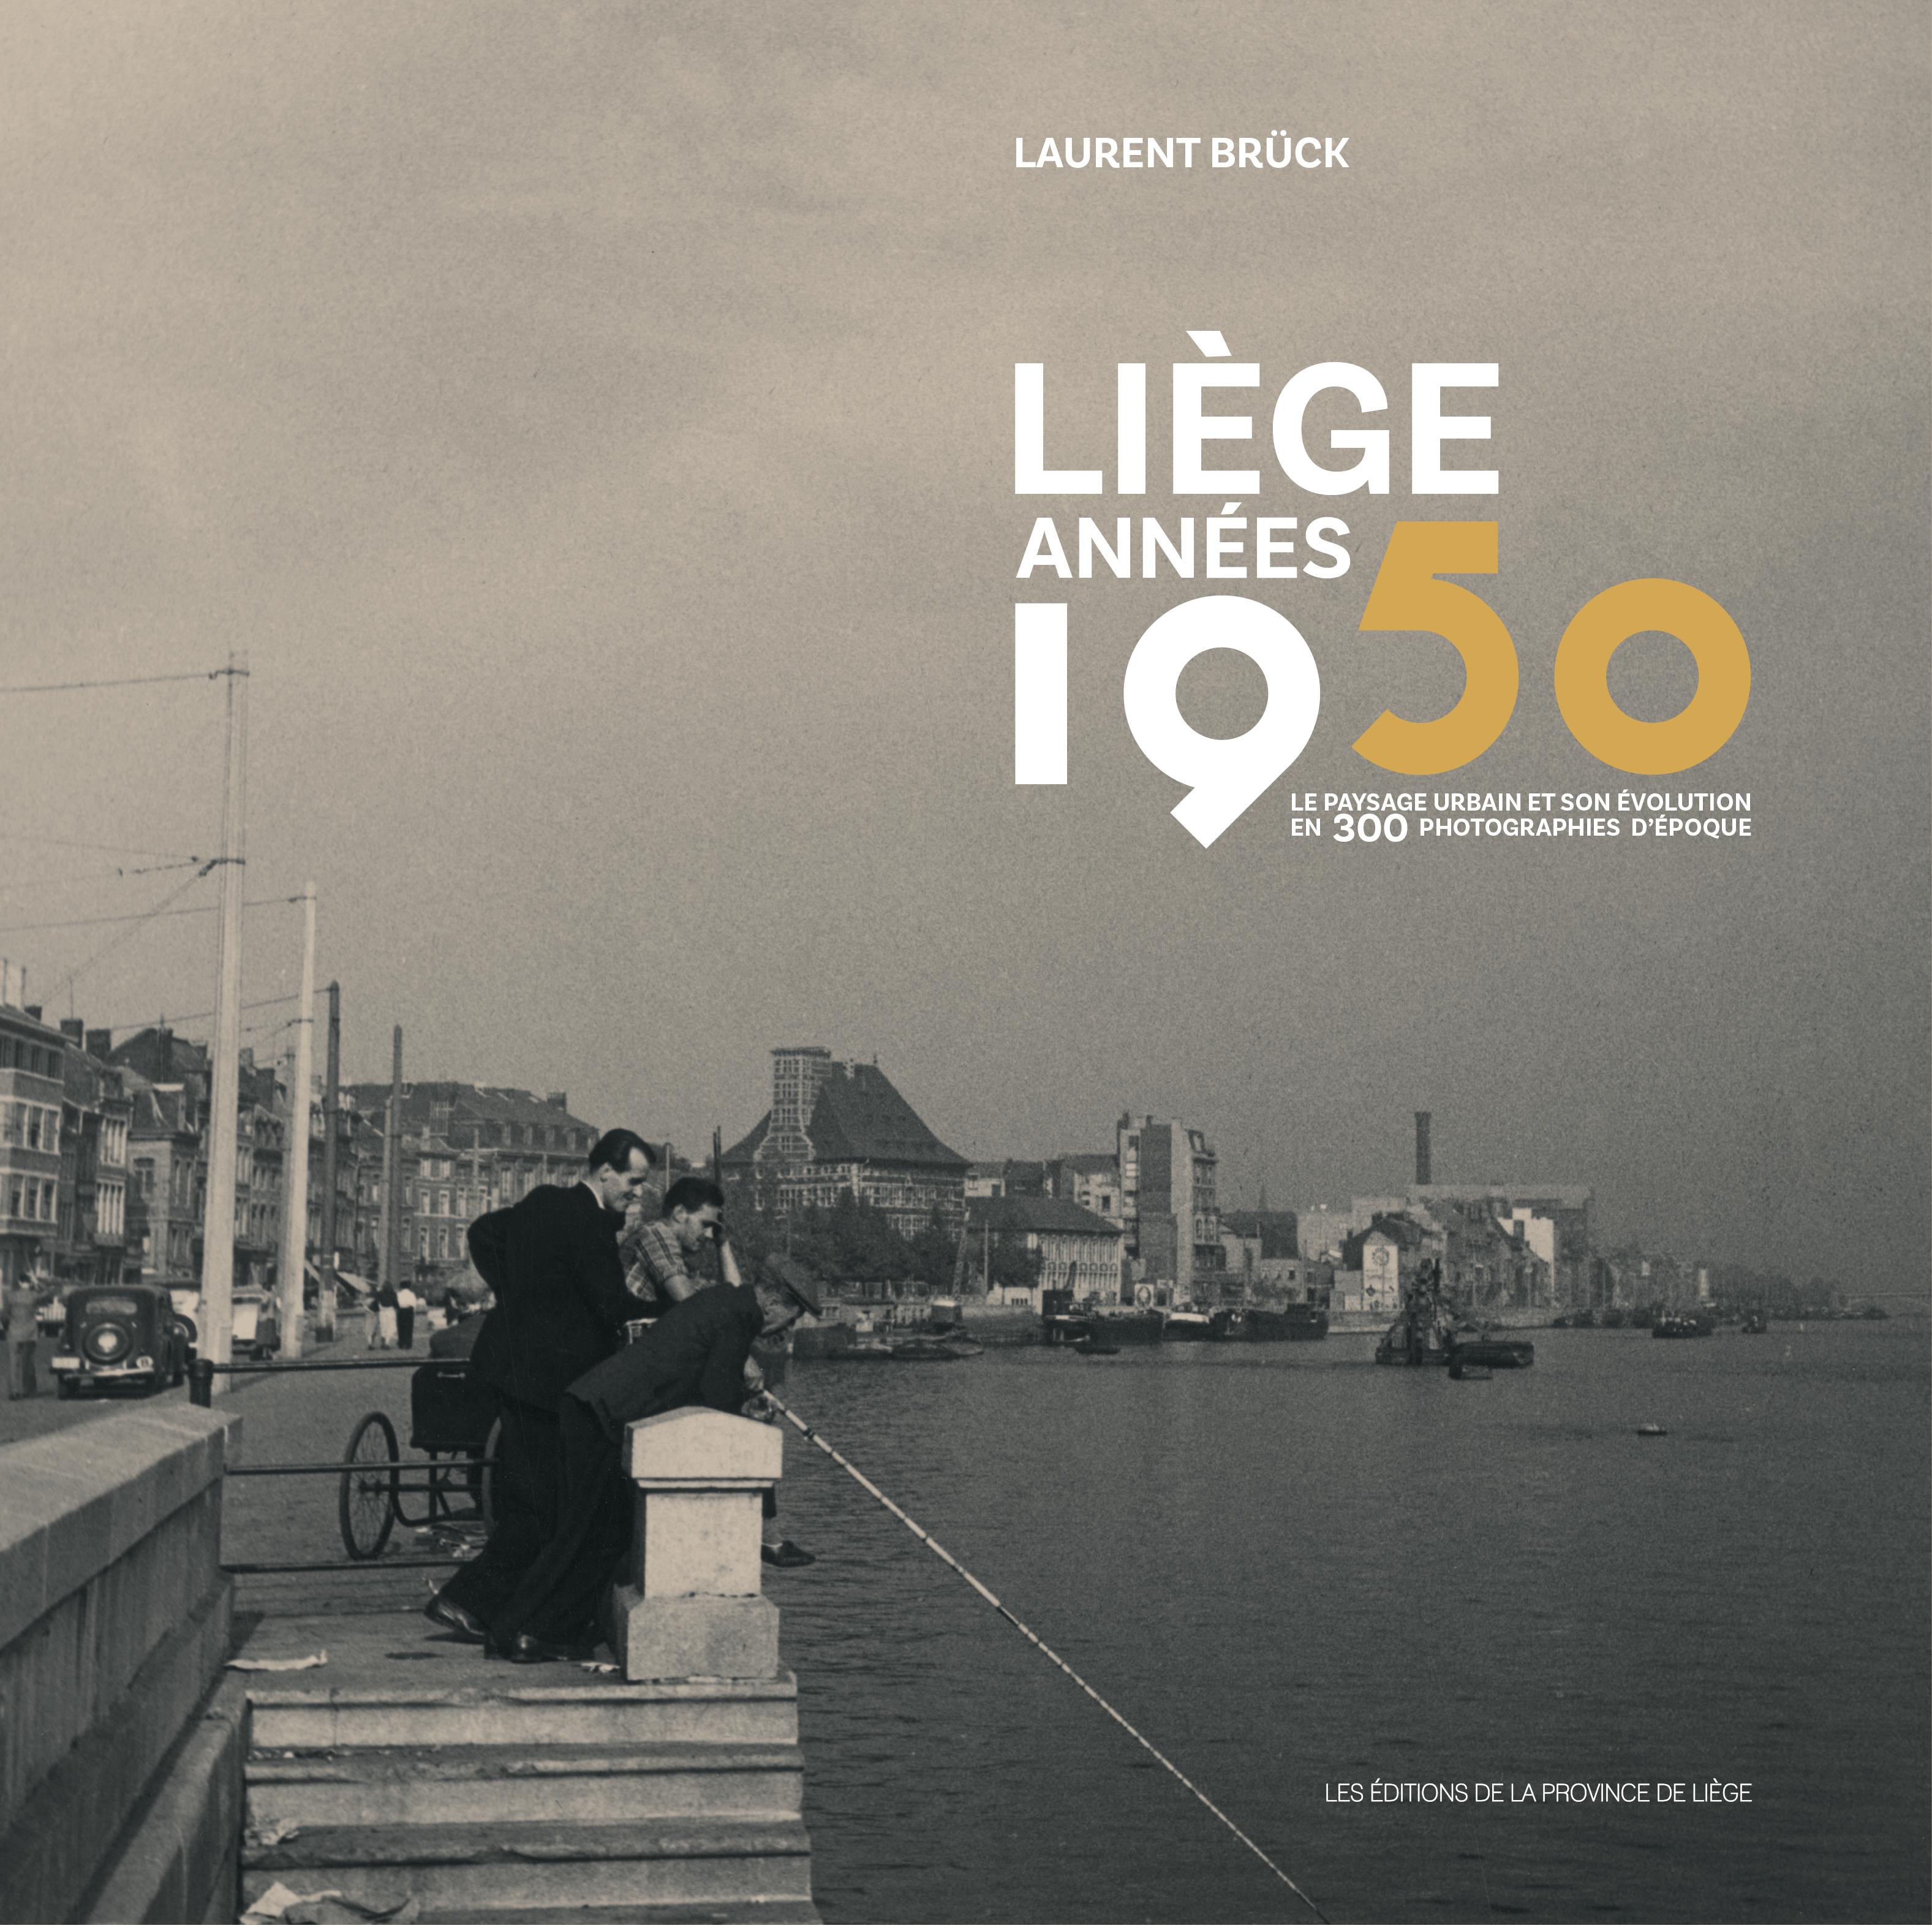 Liège années 1950